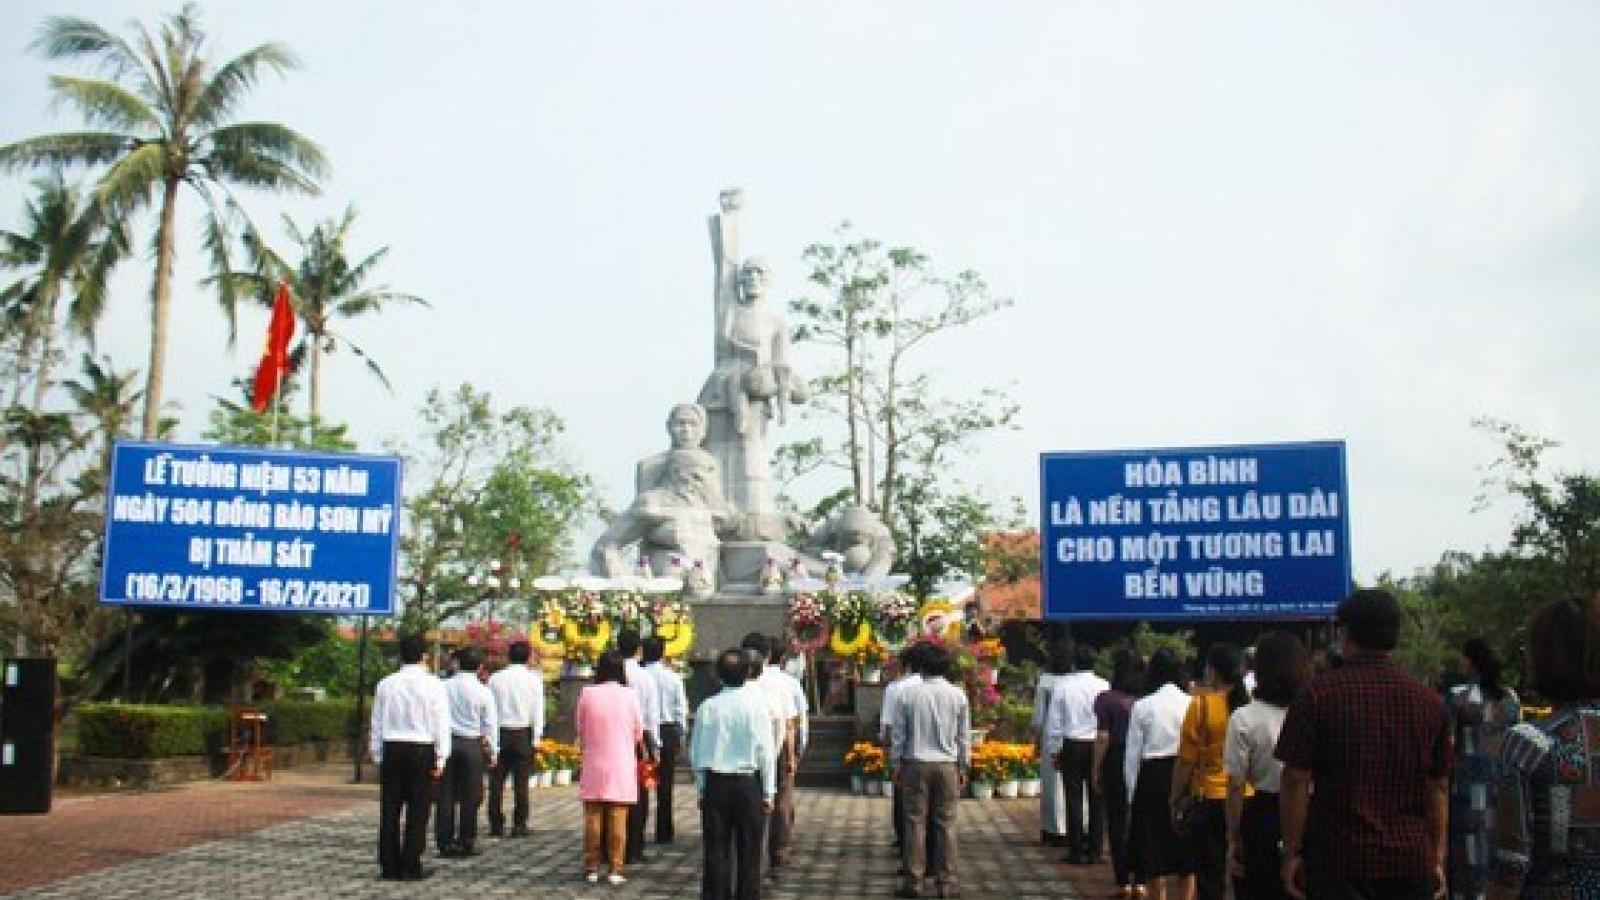 Quang Ngai commemorates victims of Son My massacre